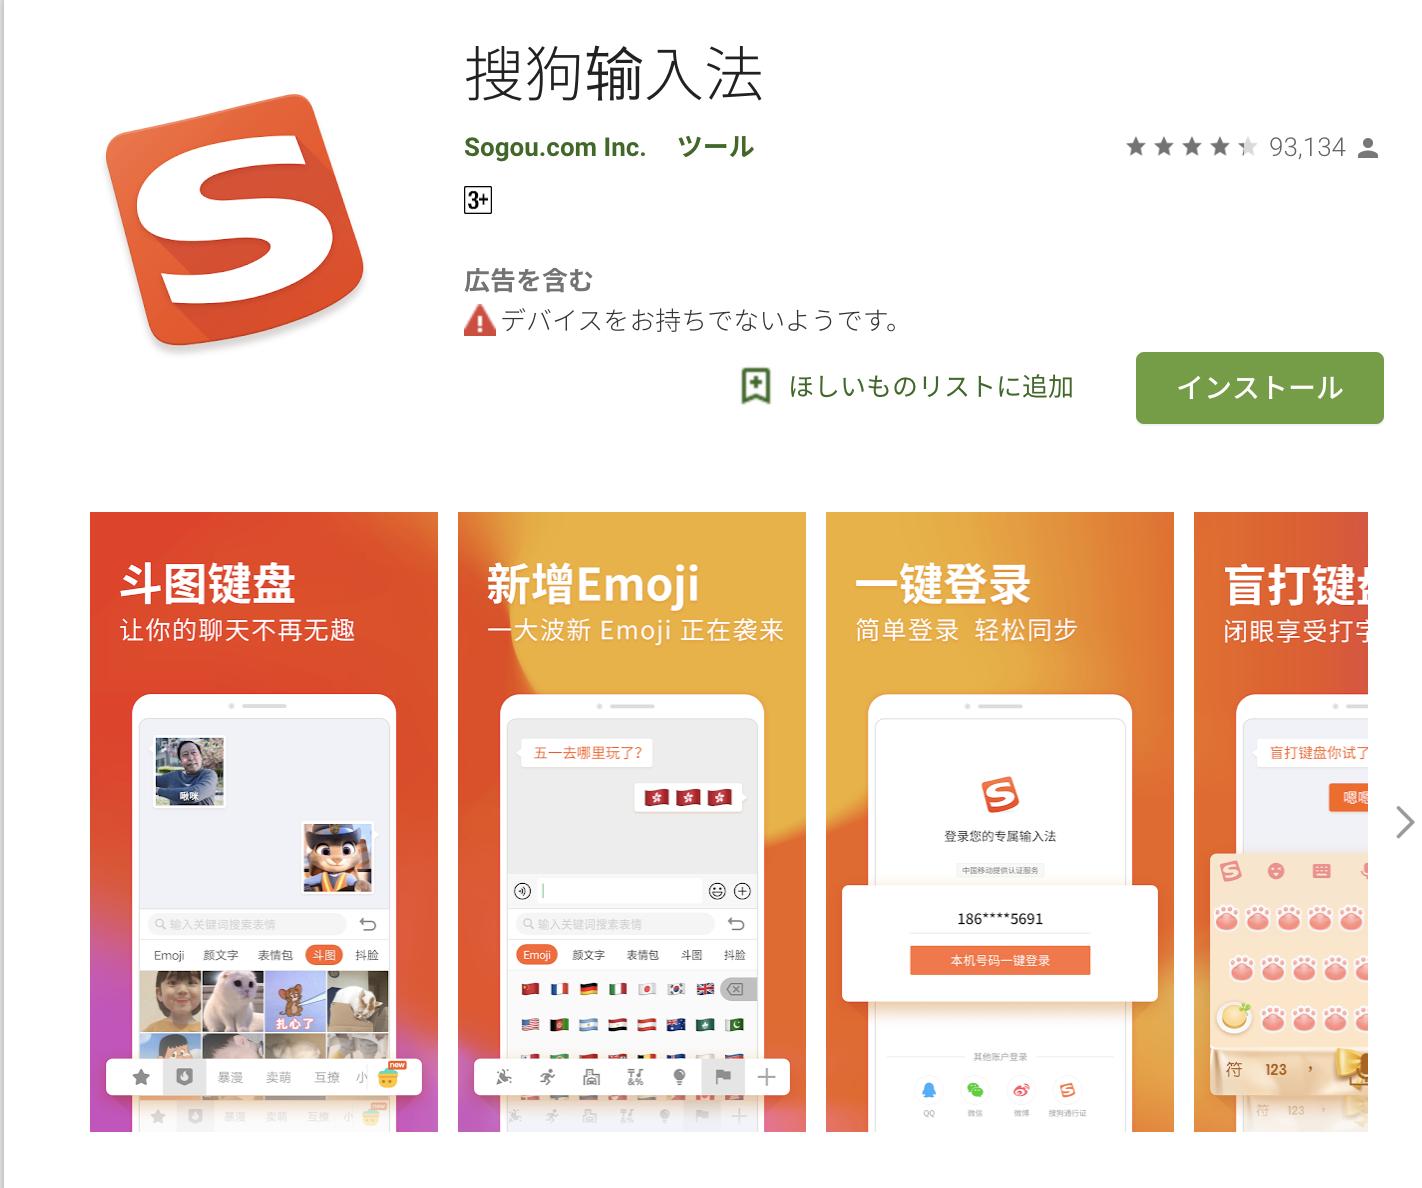 Google Playより搜狗输入法(SOUGOUインプットメソッド)